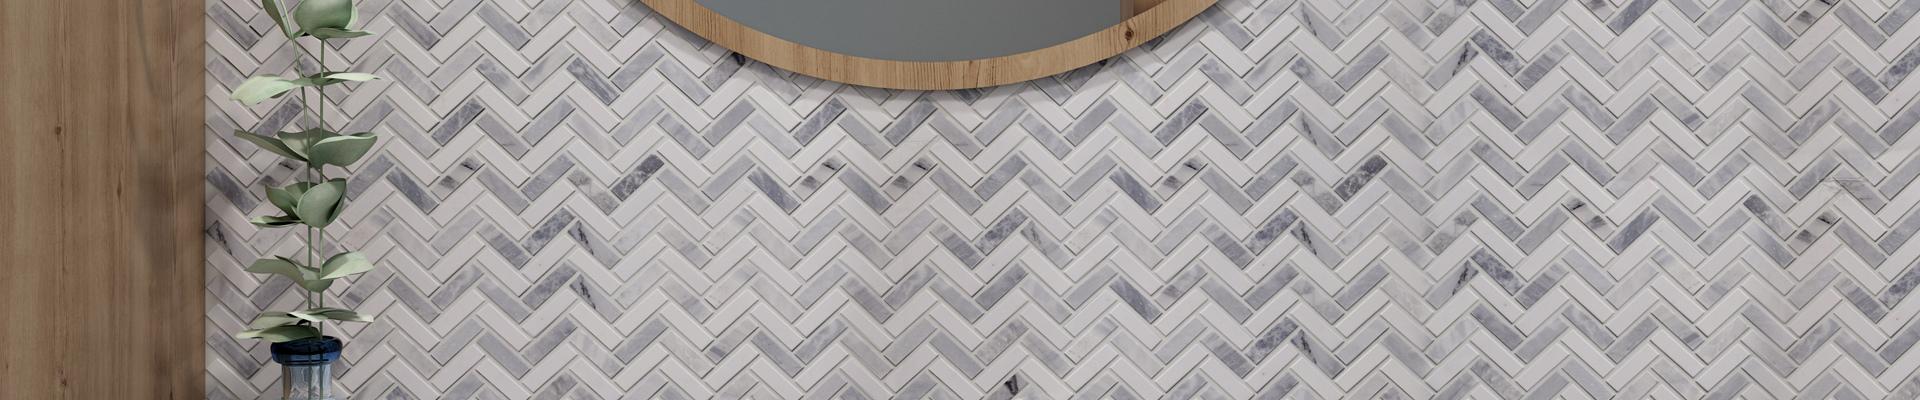 video-metal bevel edge tile factory price for living room Heng Xing-Heng Xing-img